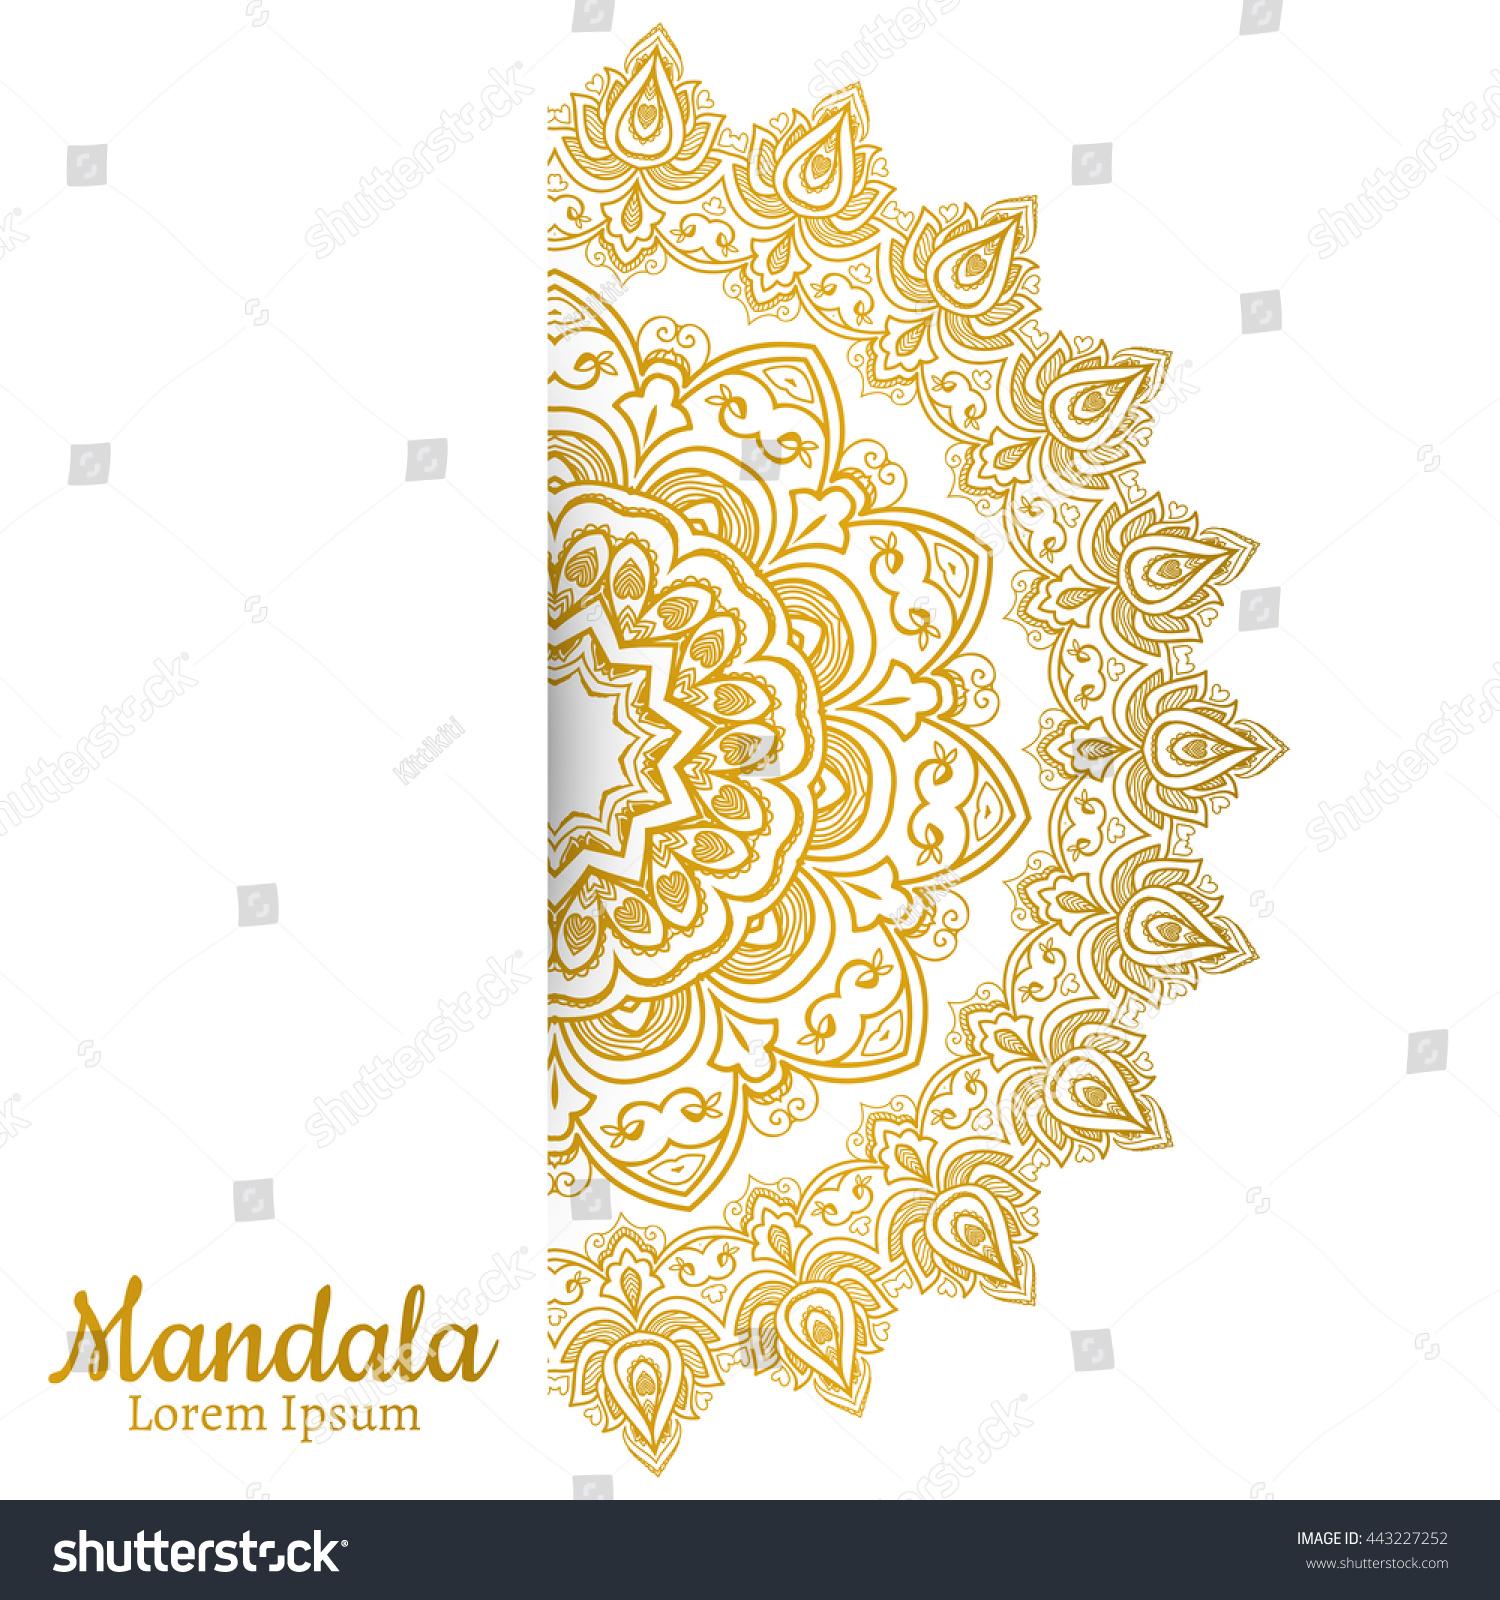 Mandala Vintage Decorative Element Ethnic Round Stock Vector ...